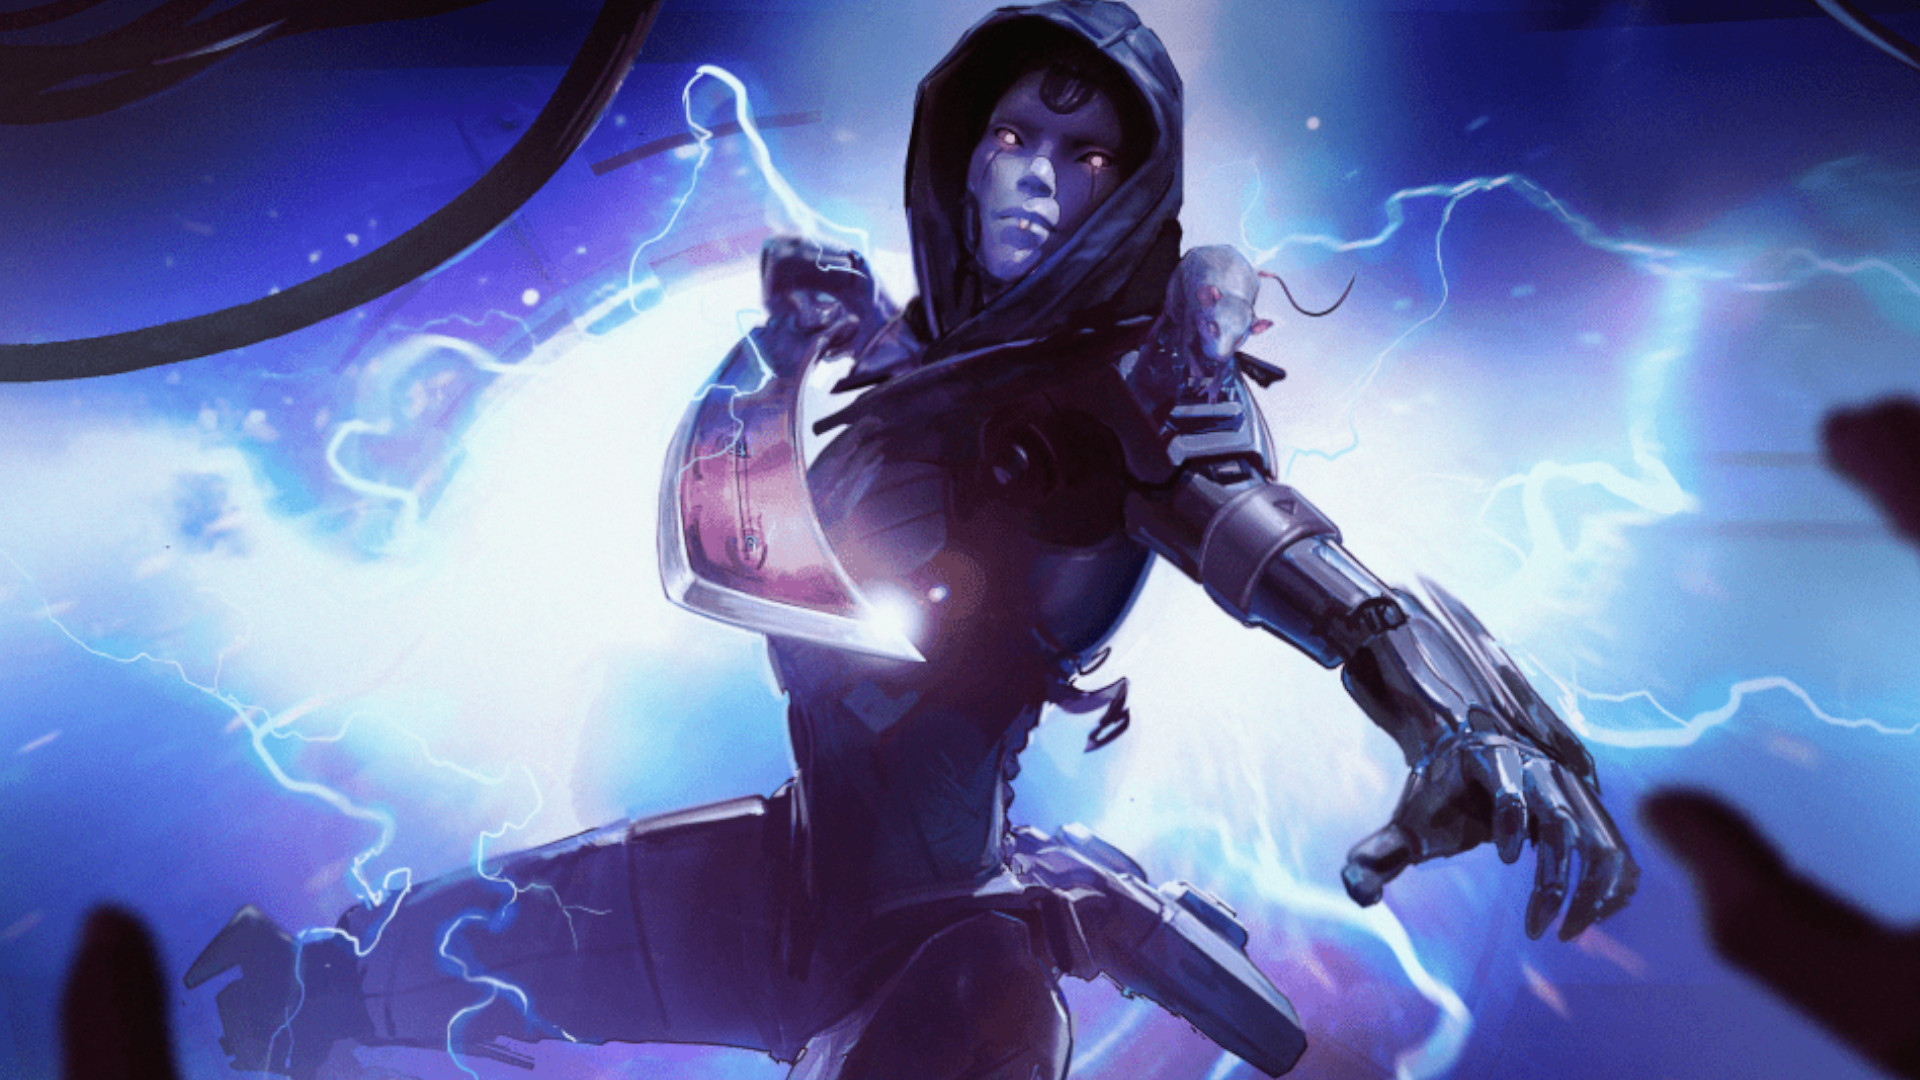 Apex Legends: Escape gameplay trailer reveals Ash's abilities